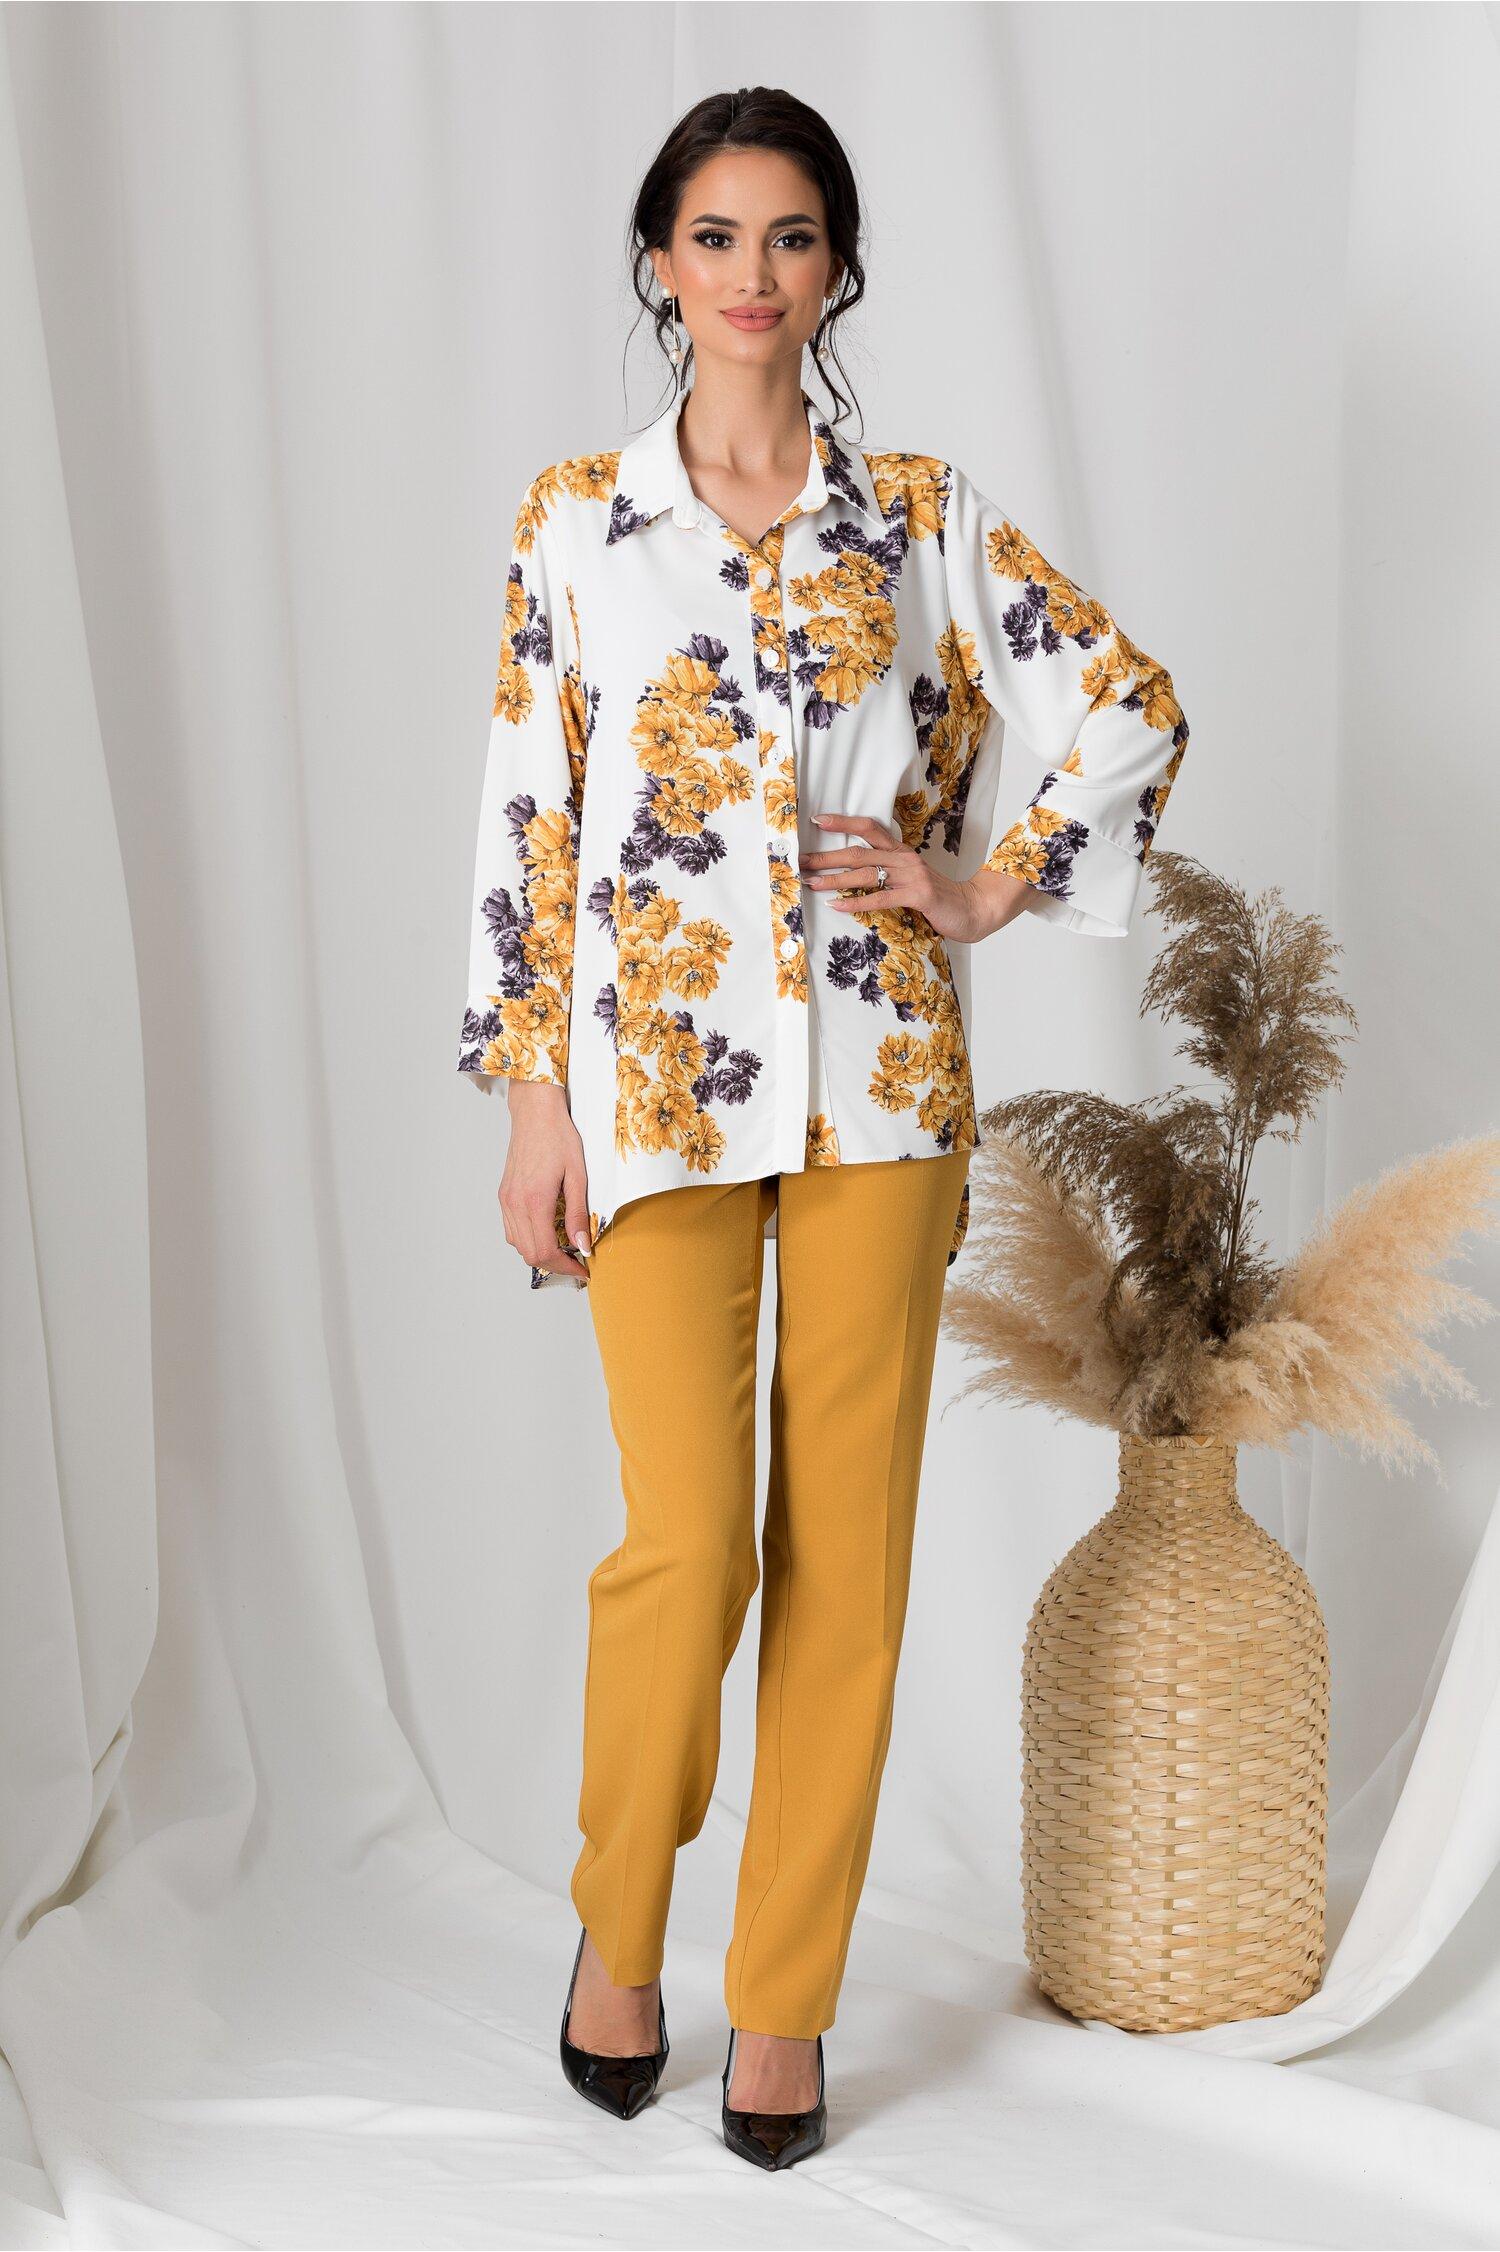 Compleu Adela cu pantaloni galbeni si camasa alba cu flori